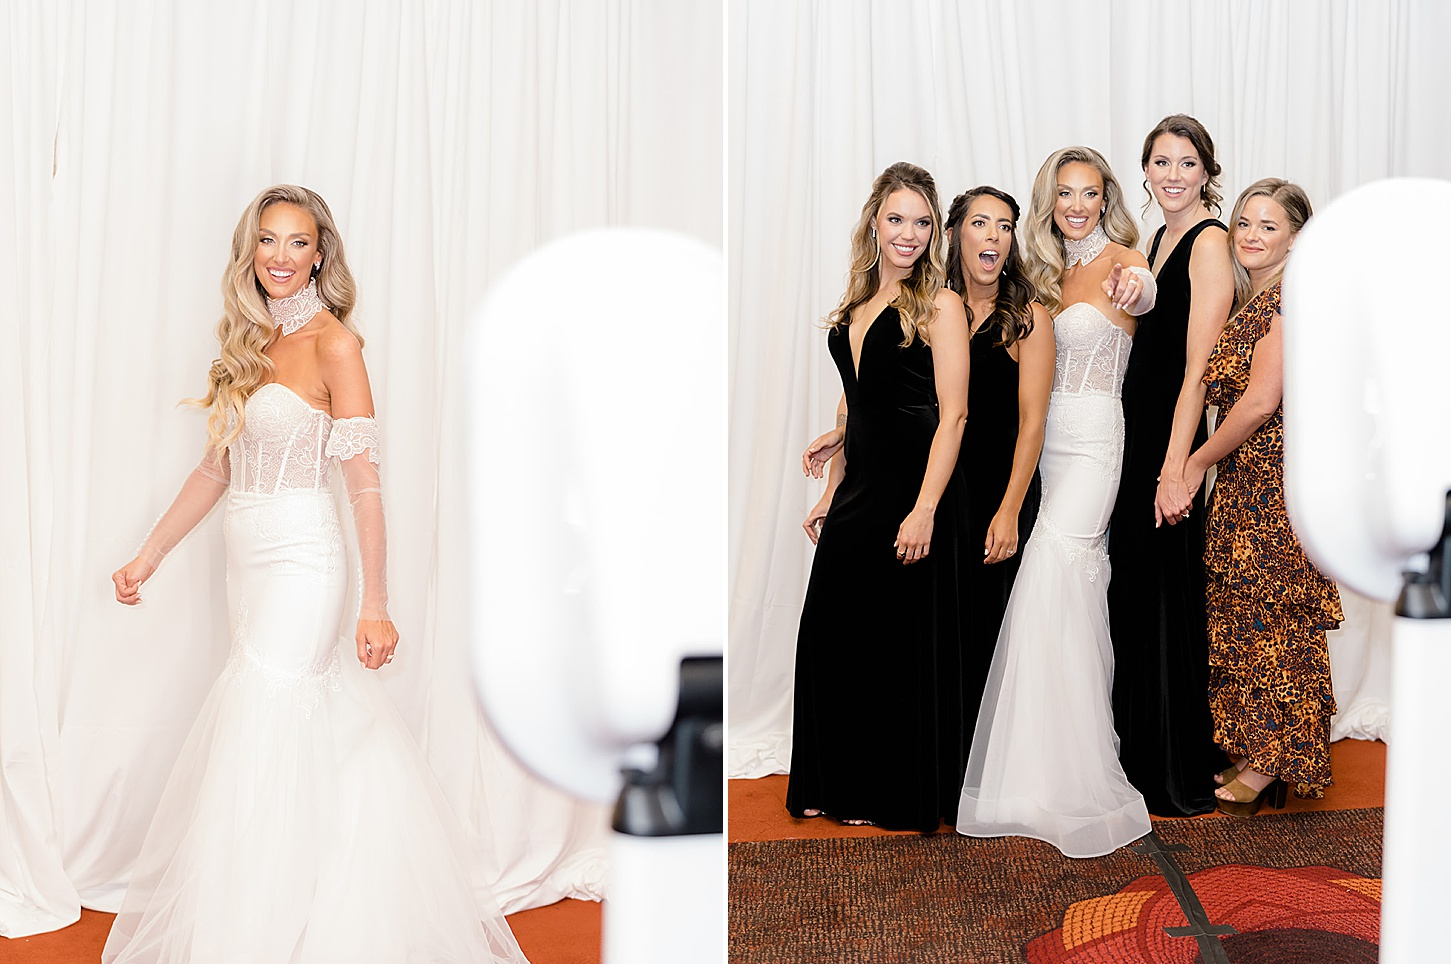 Atlantic City Wedding Photography Studio by Magdalena Studios Lexy Cha 0095